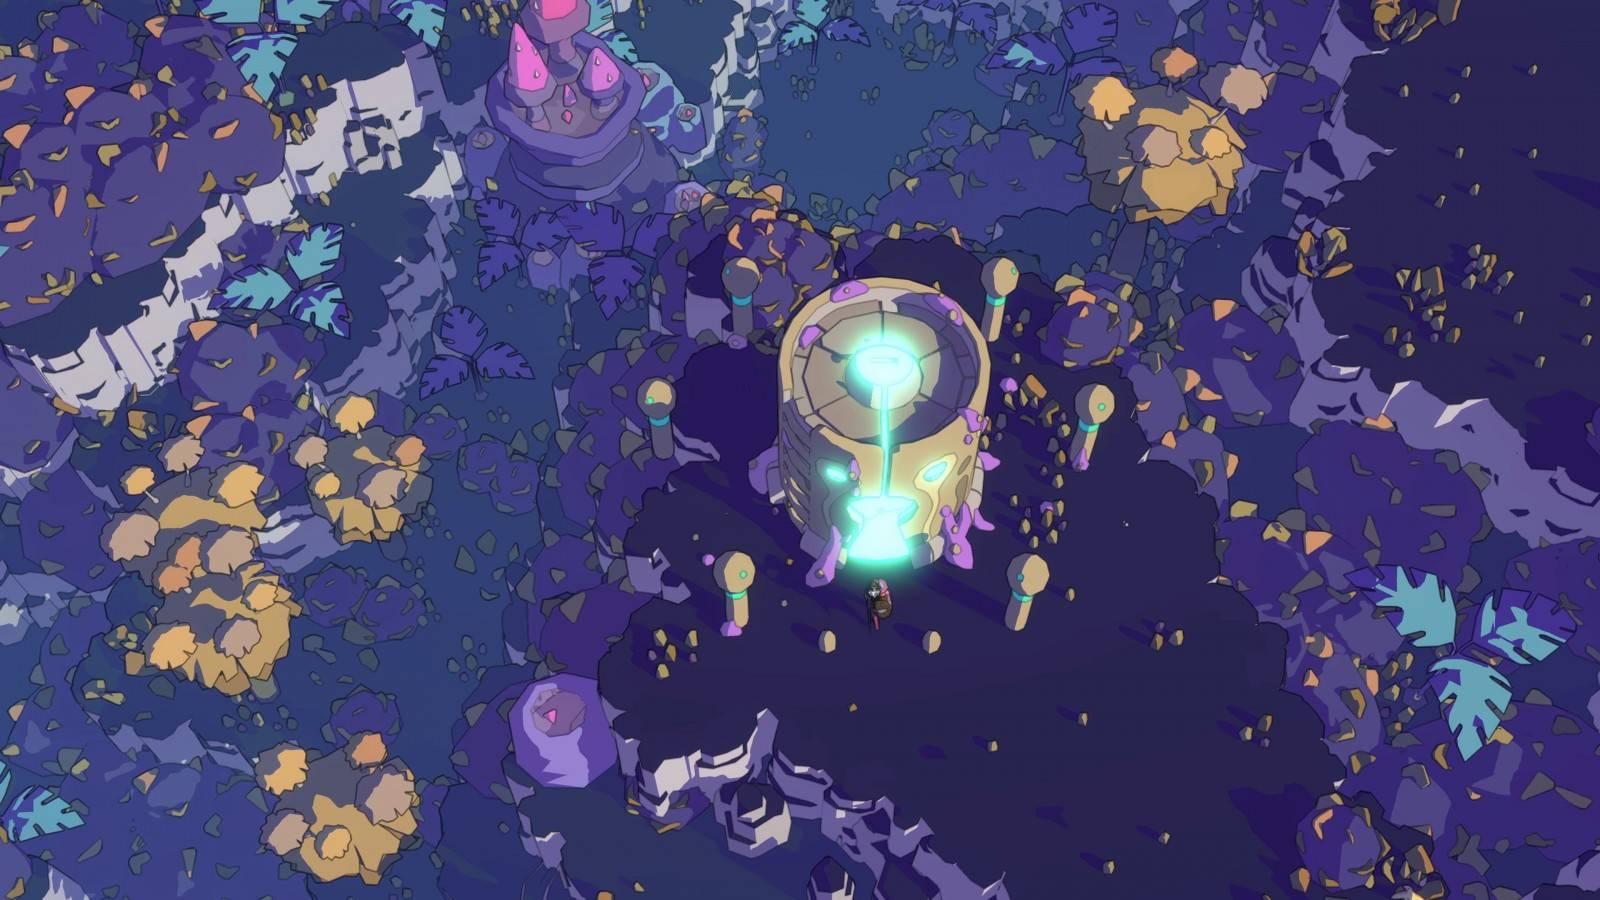 Unexplored 2: The Watfarer's Legacy